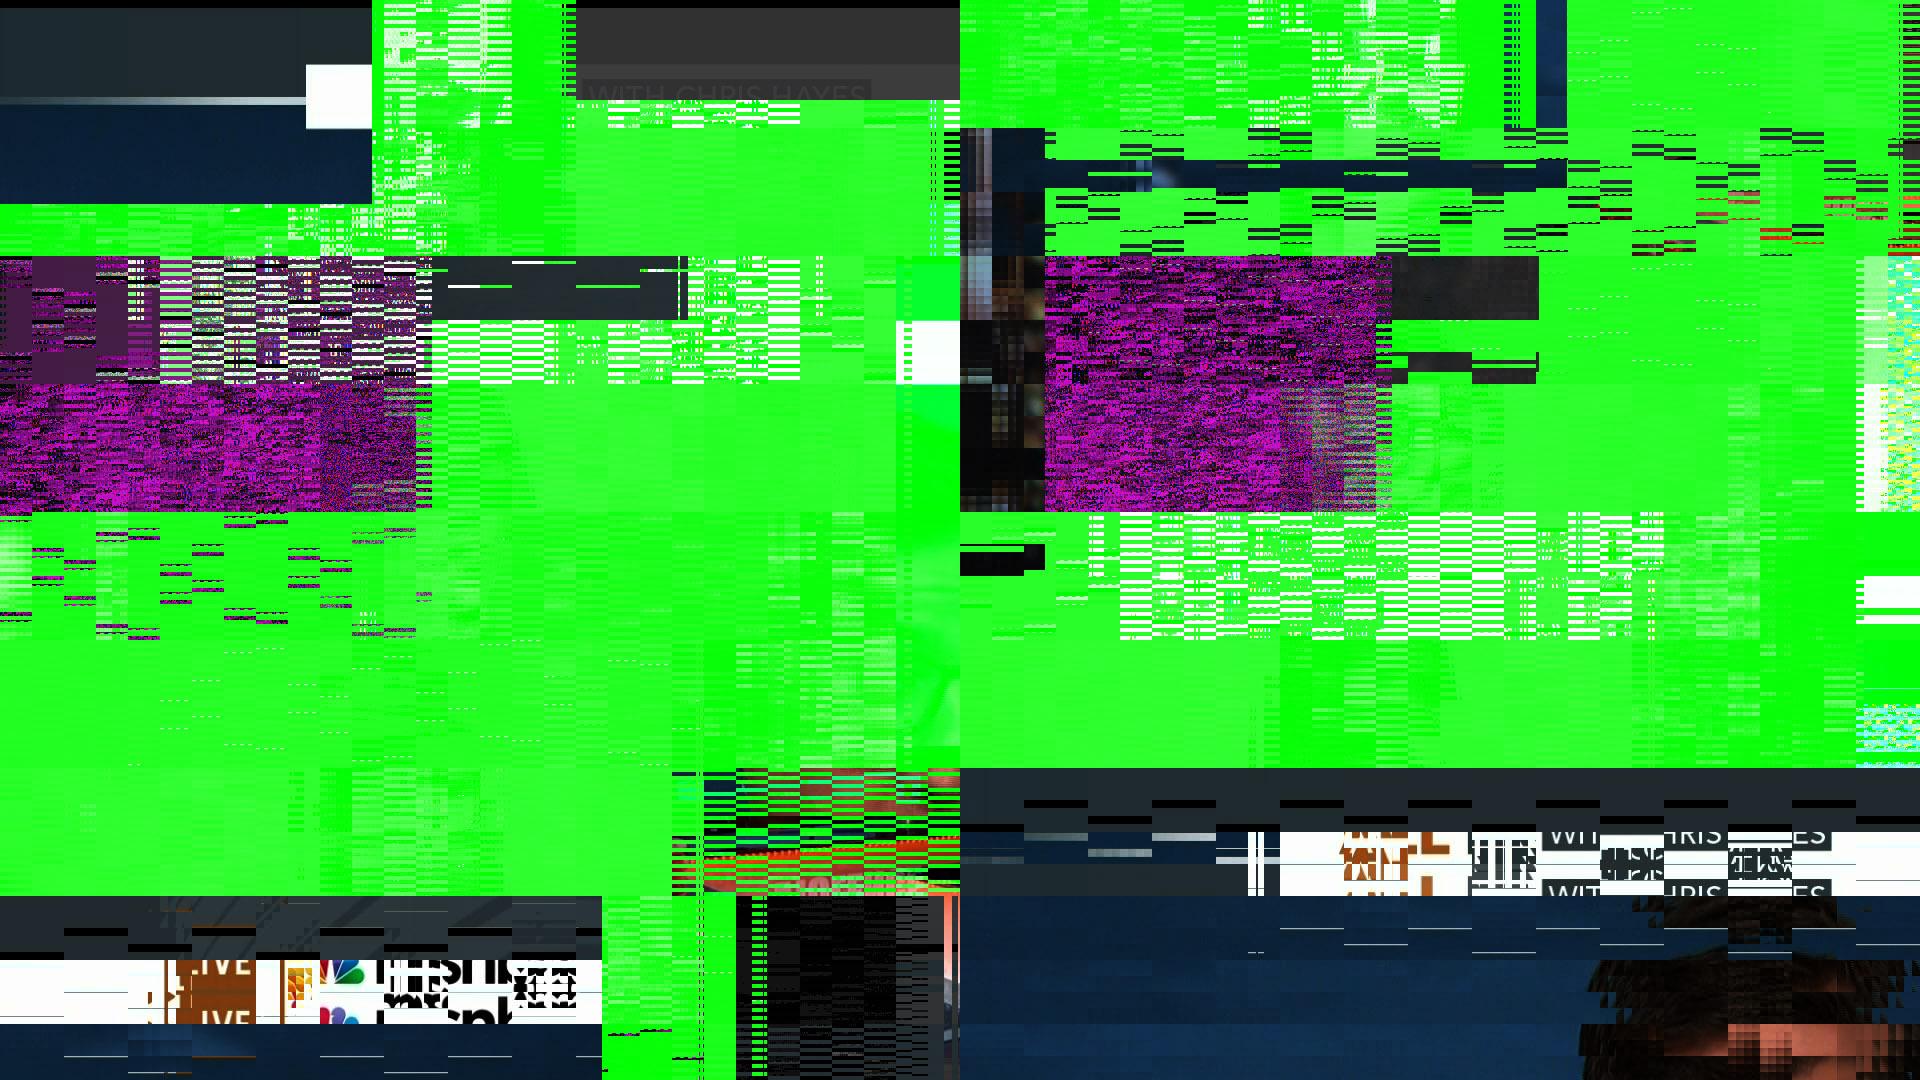 13.09.17-Main Output-20.20.21